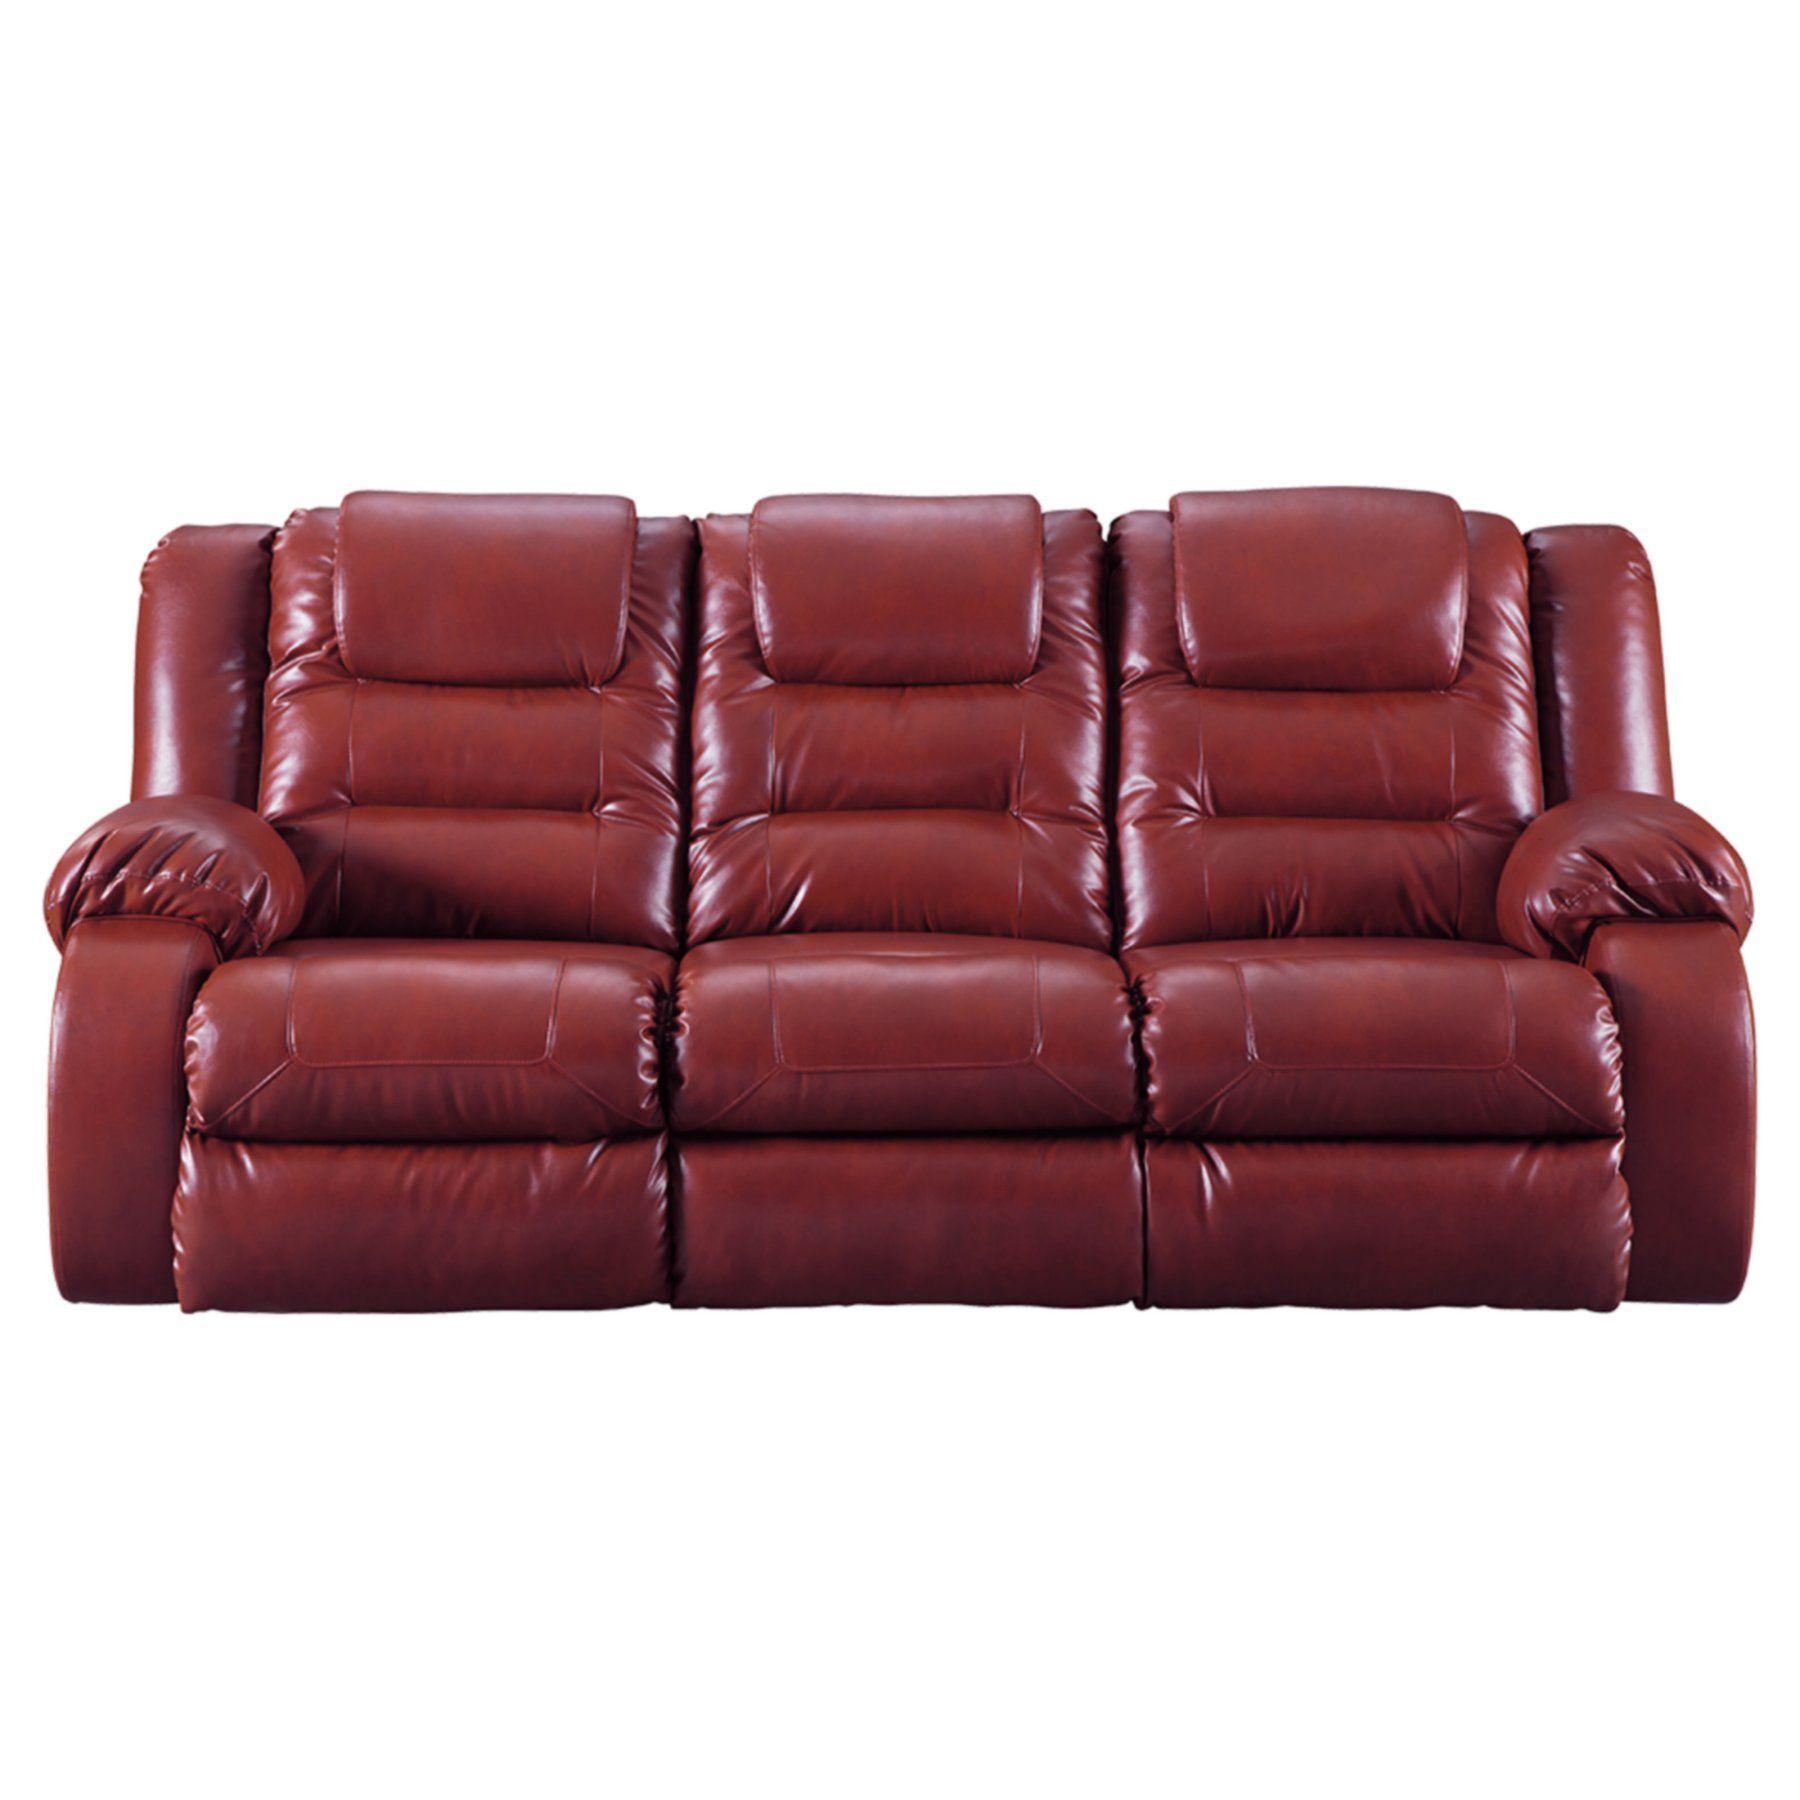 signature design by ashley vacherie reclining sofa 7930688 rh pinterest com